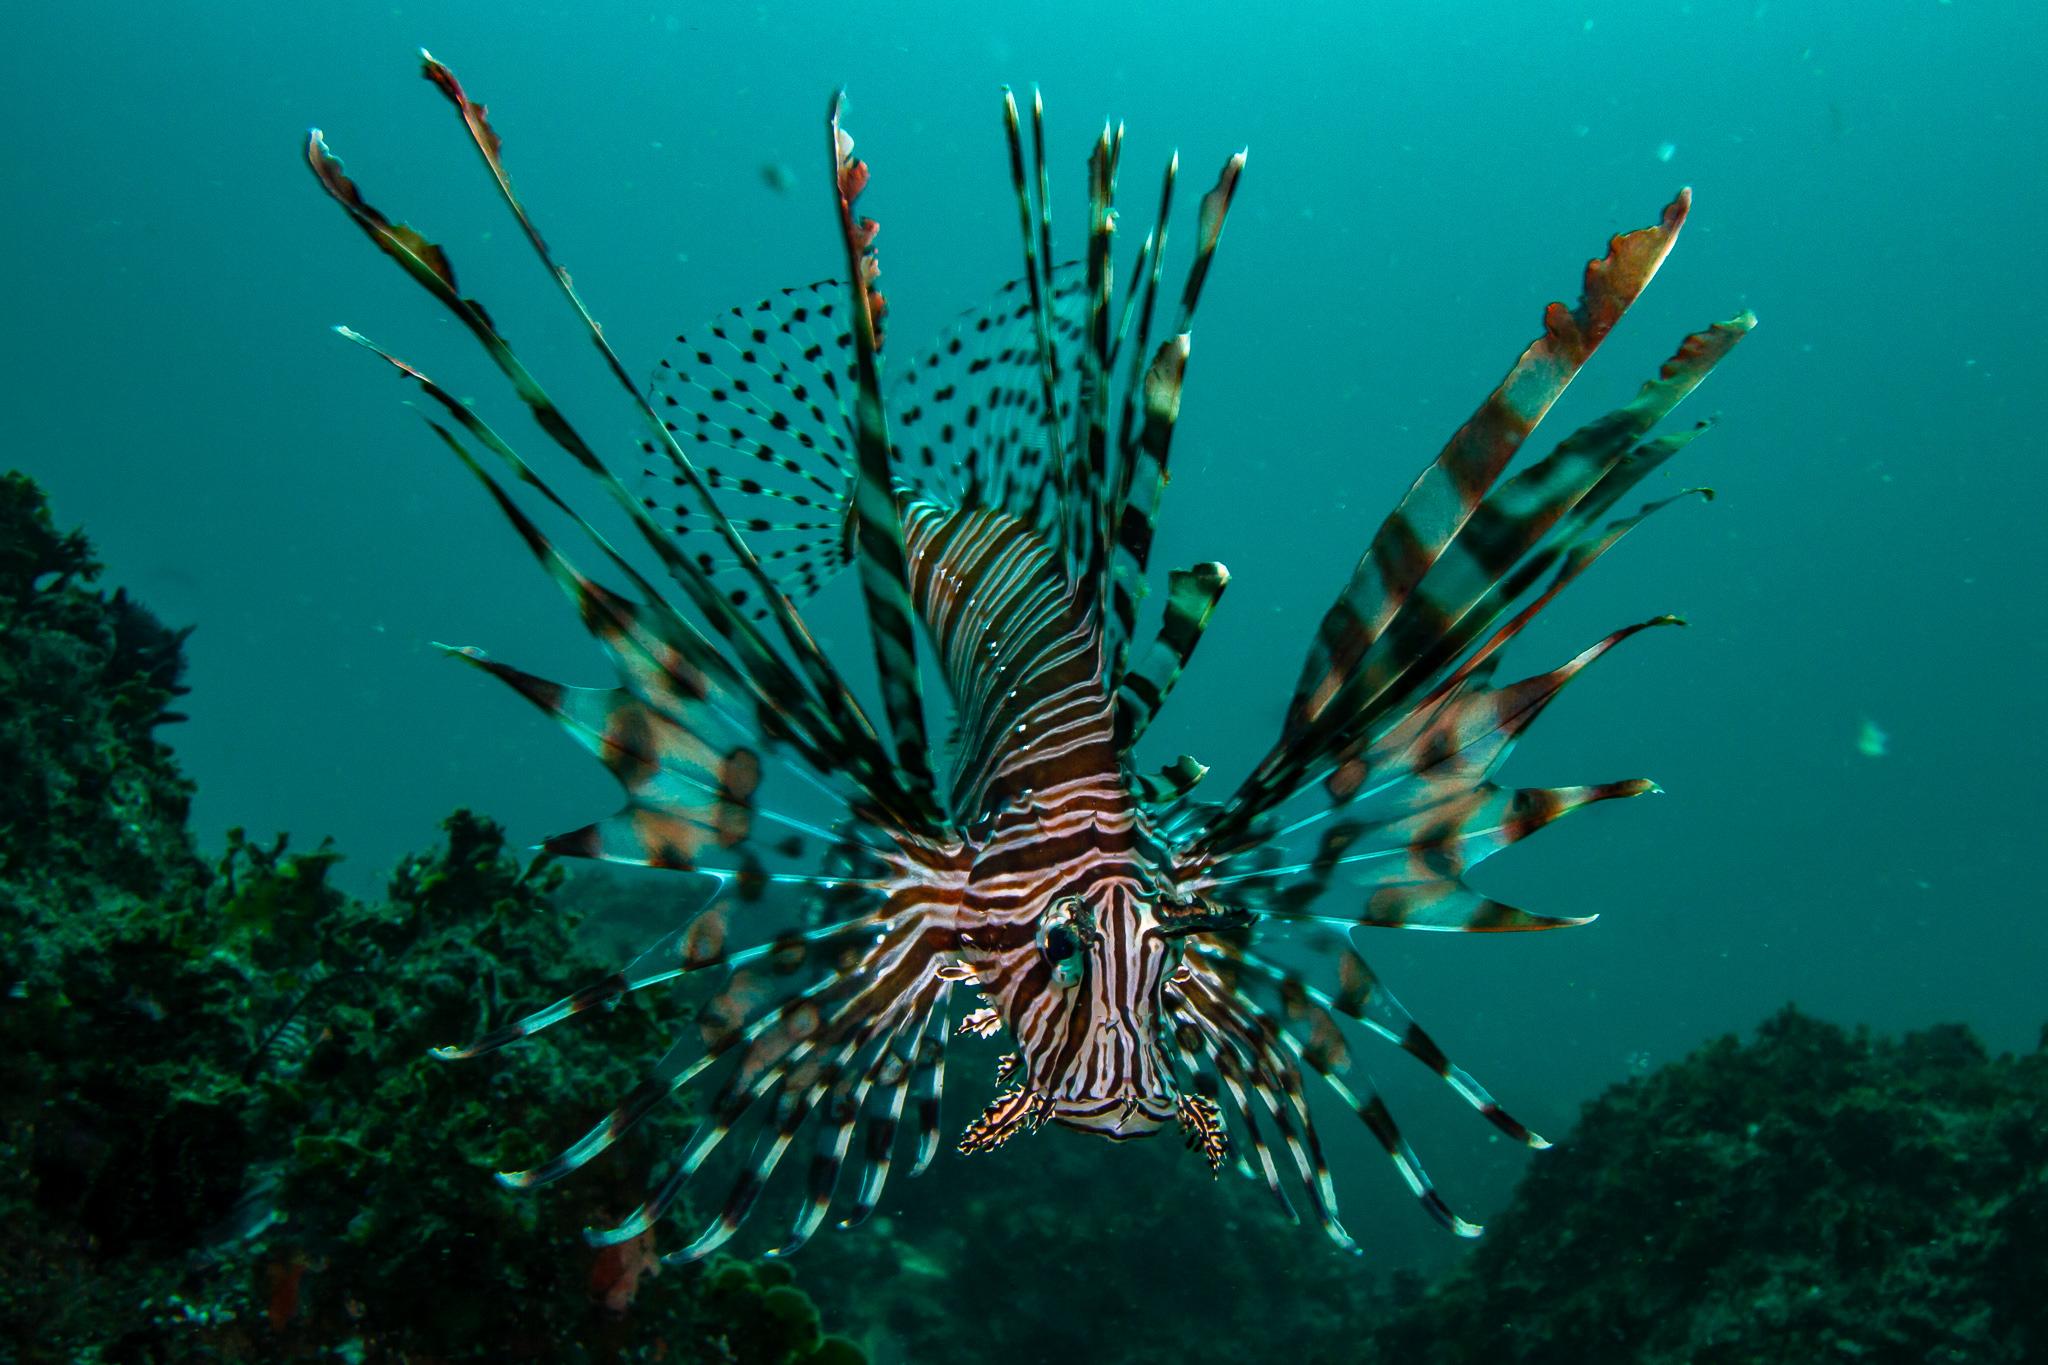 Lionfish Julian Rocks NSW Australia